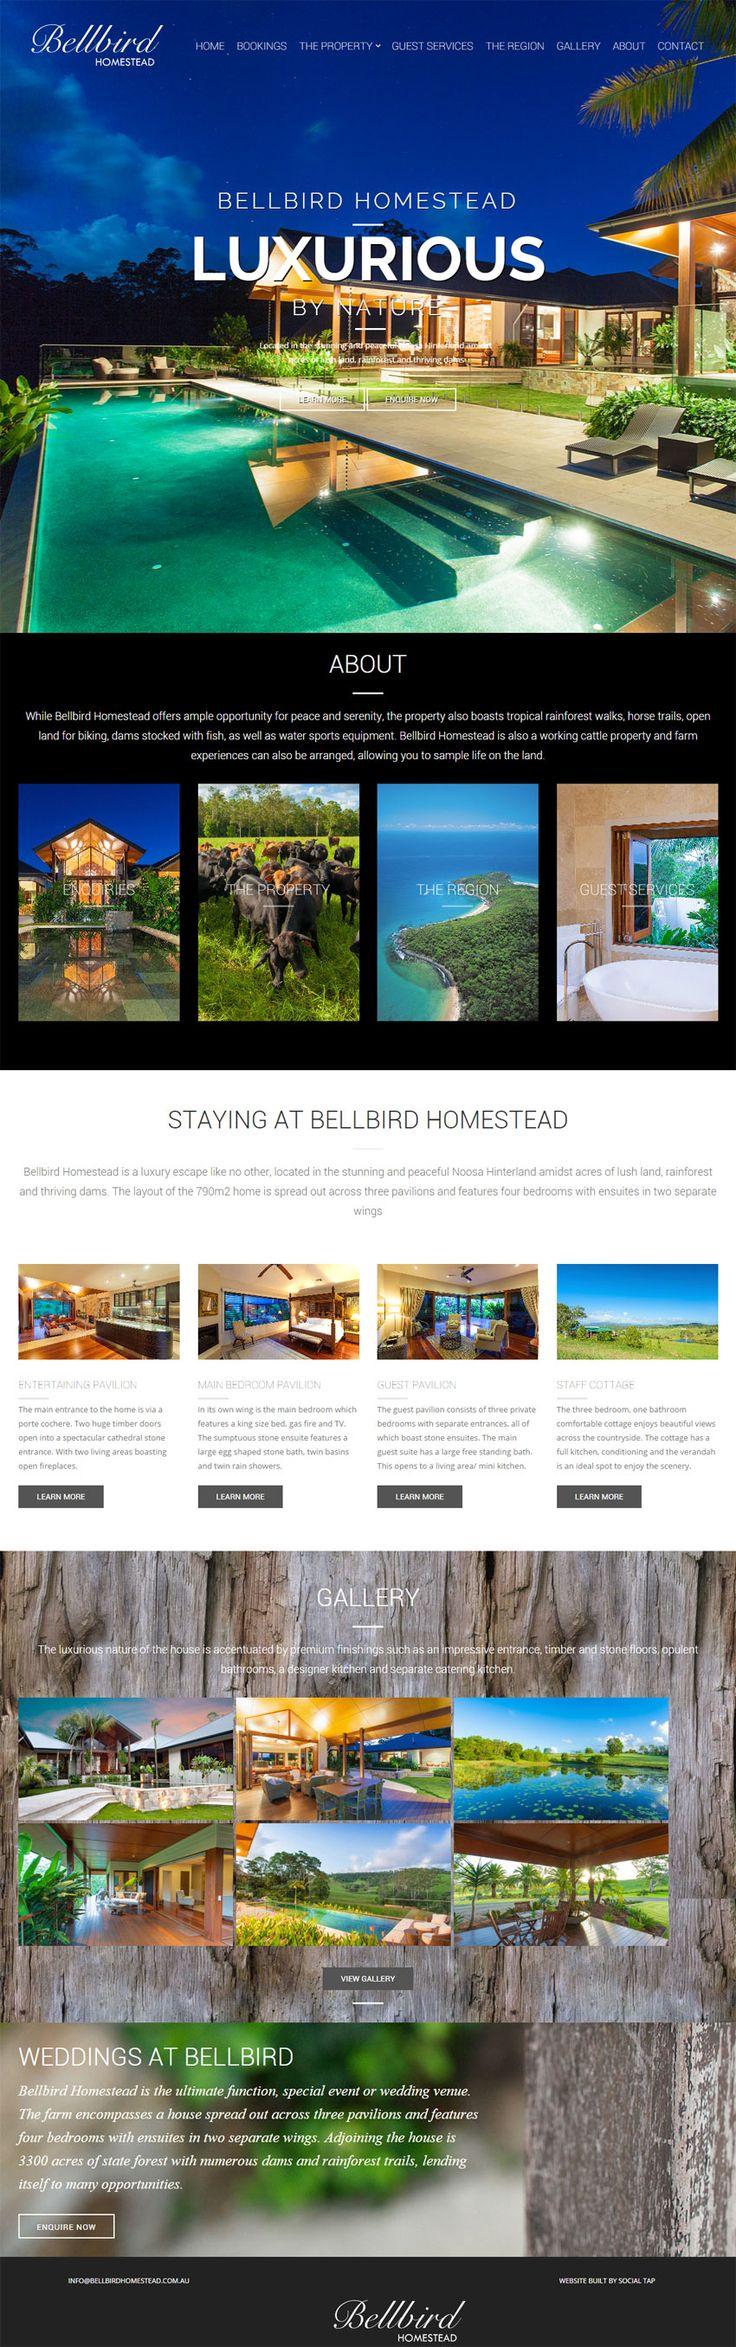 Website design for Bellbird Homestead Luxury Accommodation & Tourist Destination in Cooroy QLD, Australia. Websites for Hospitality, Tourism, Food & Wine designed & built by SocialTap.com.au